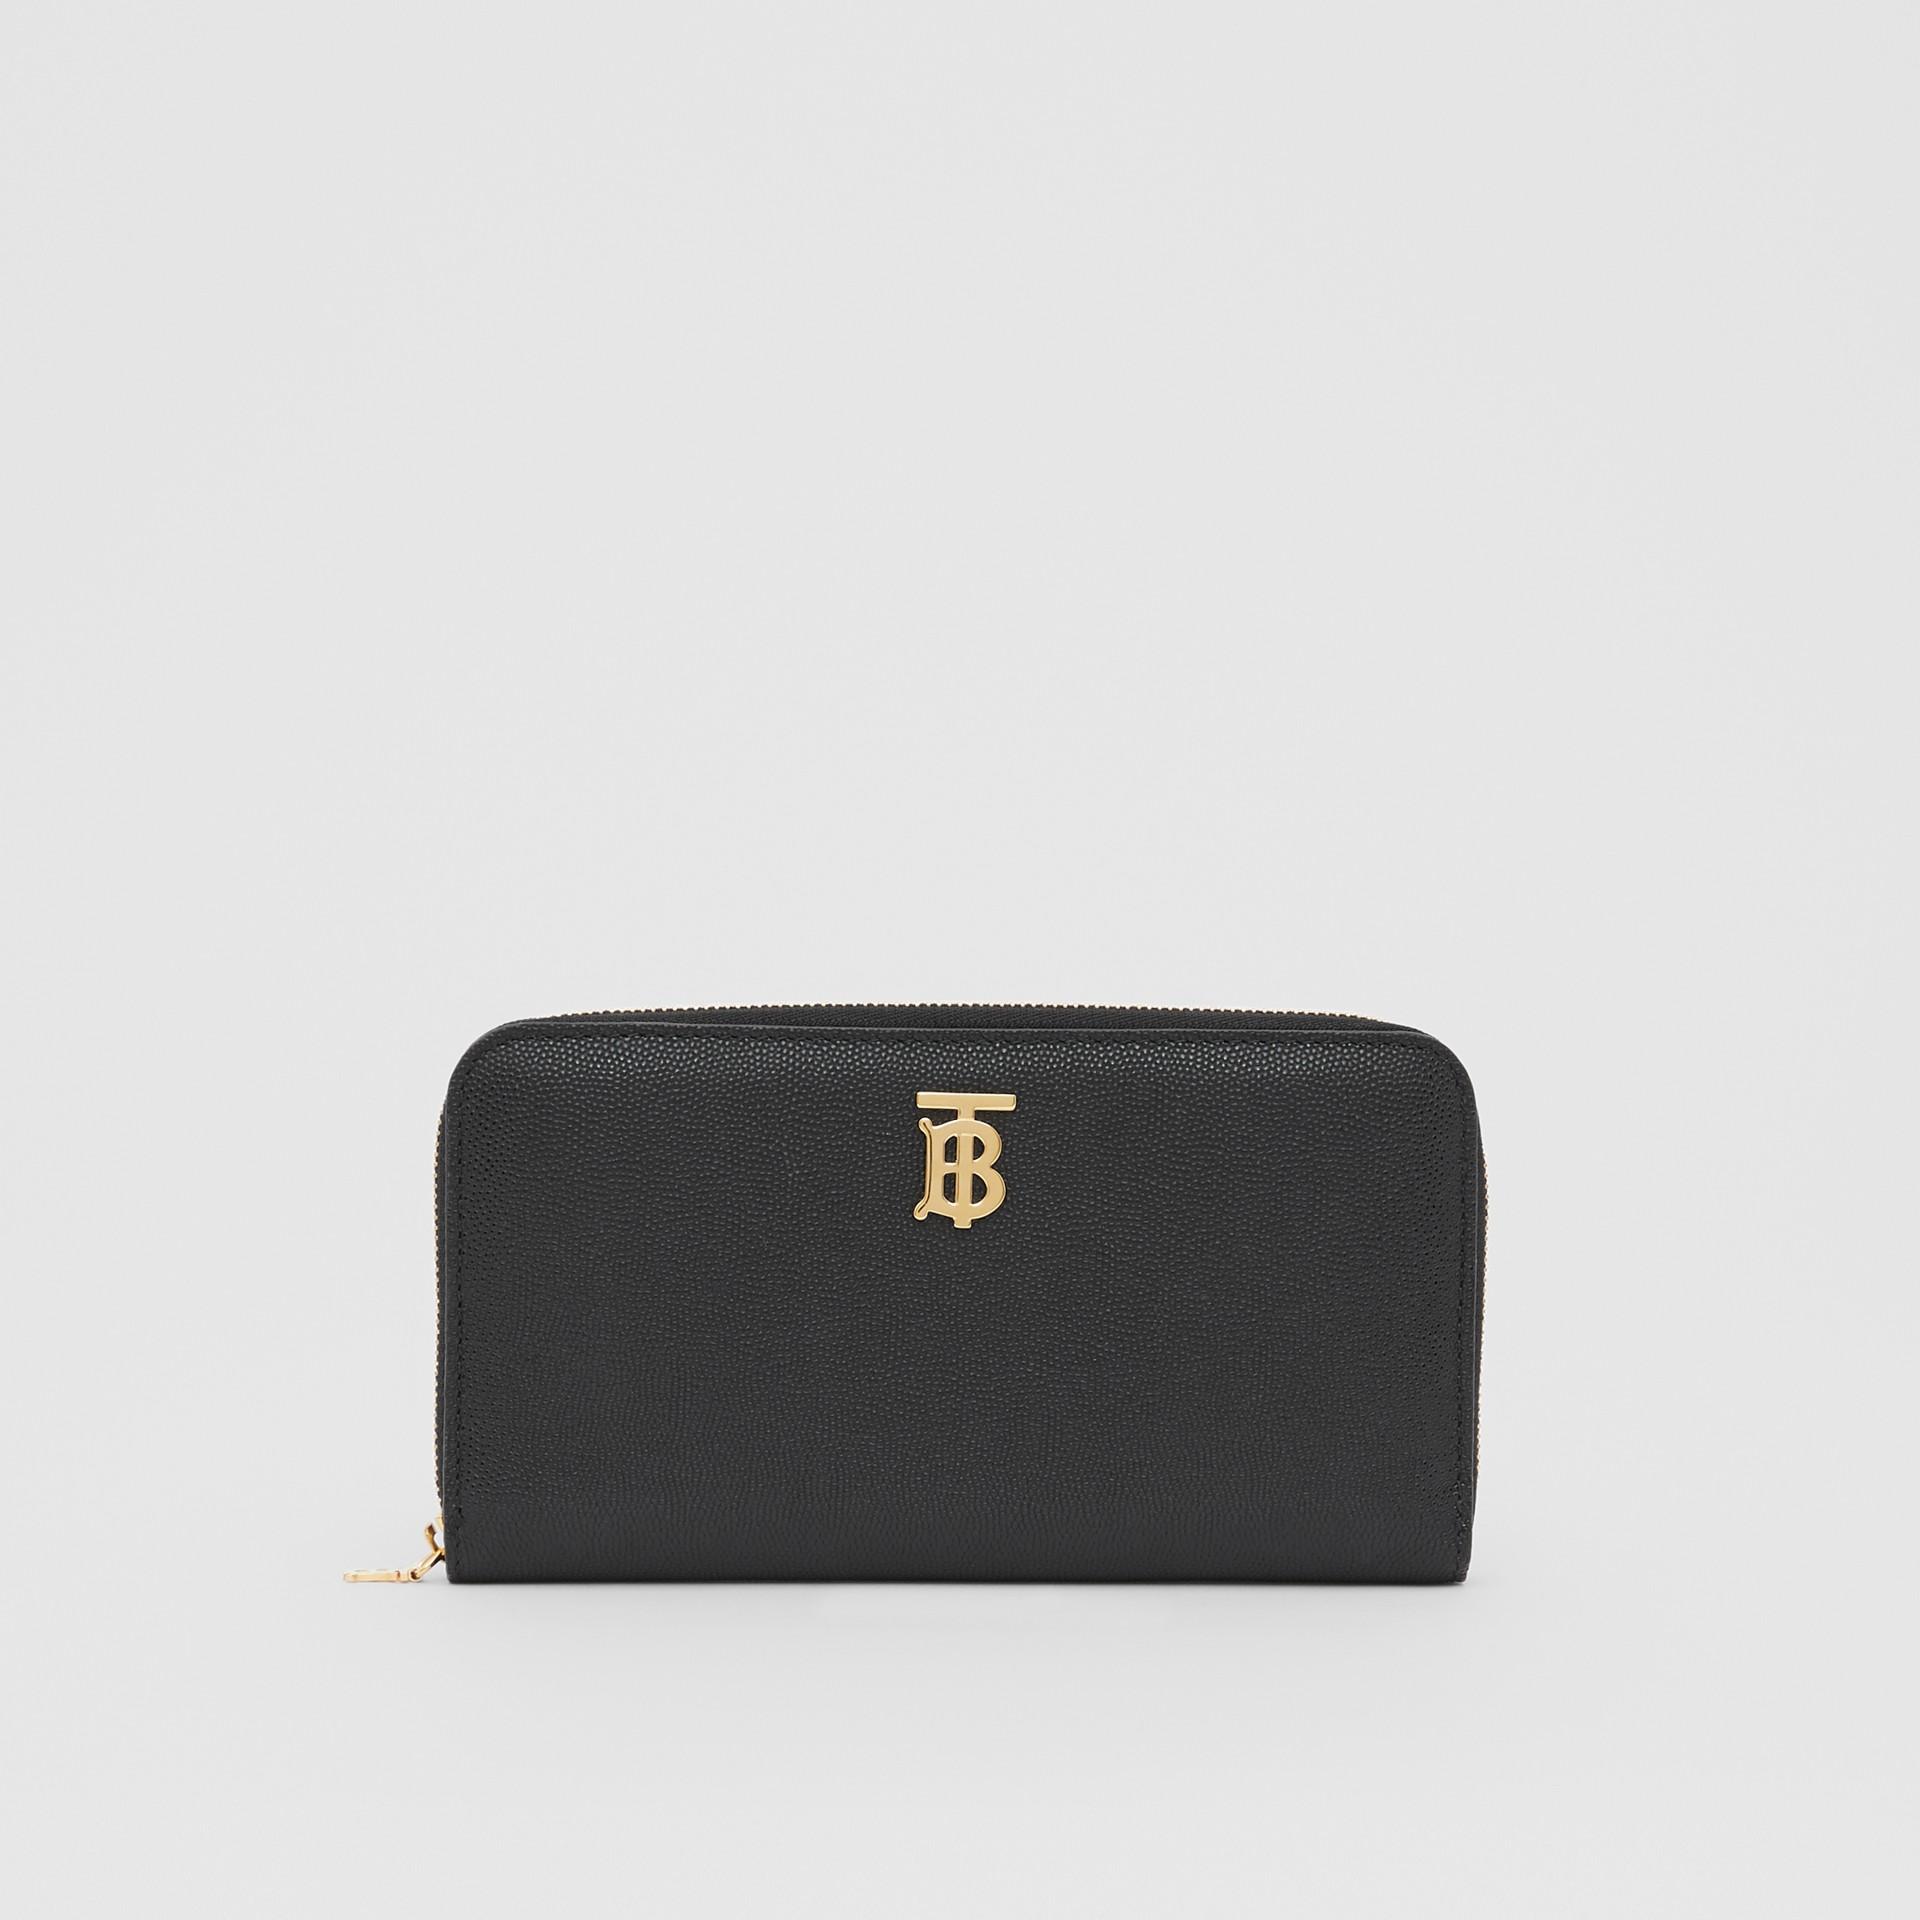 Monogram Motif Grainy Leather Ziparound Wallet in Black - Women | Burberry Australia - gallery image 0